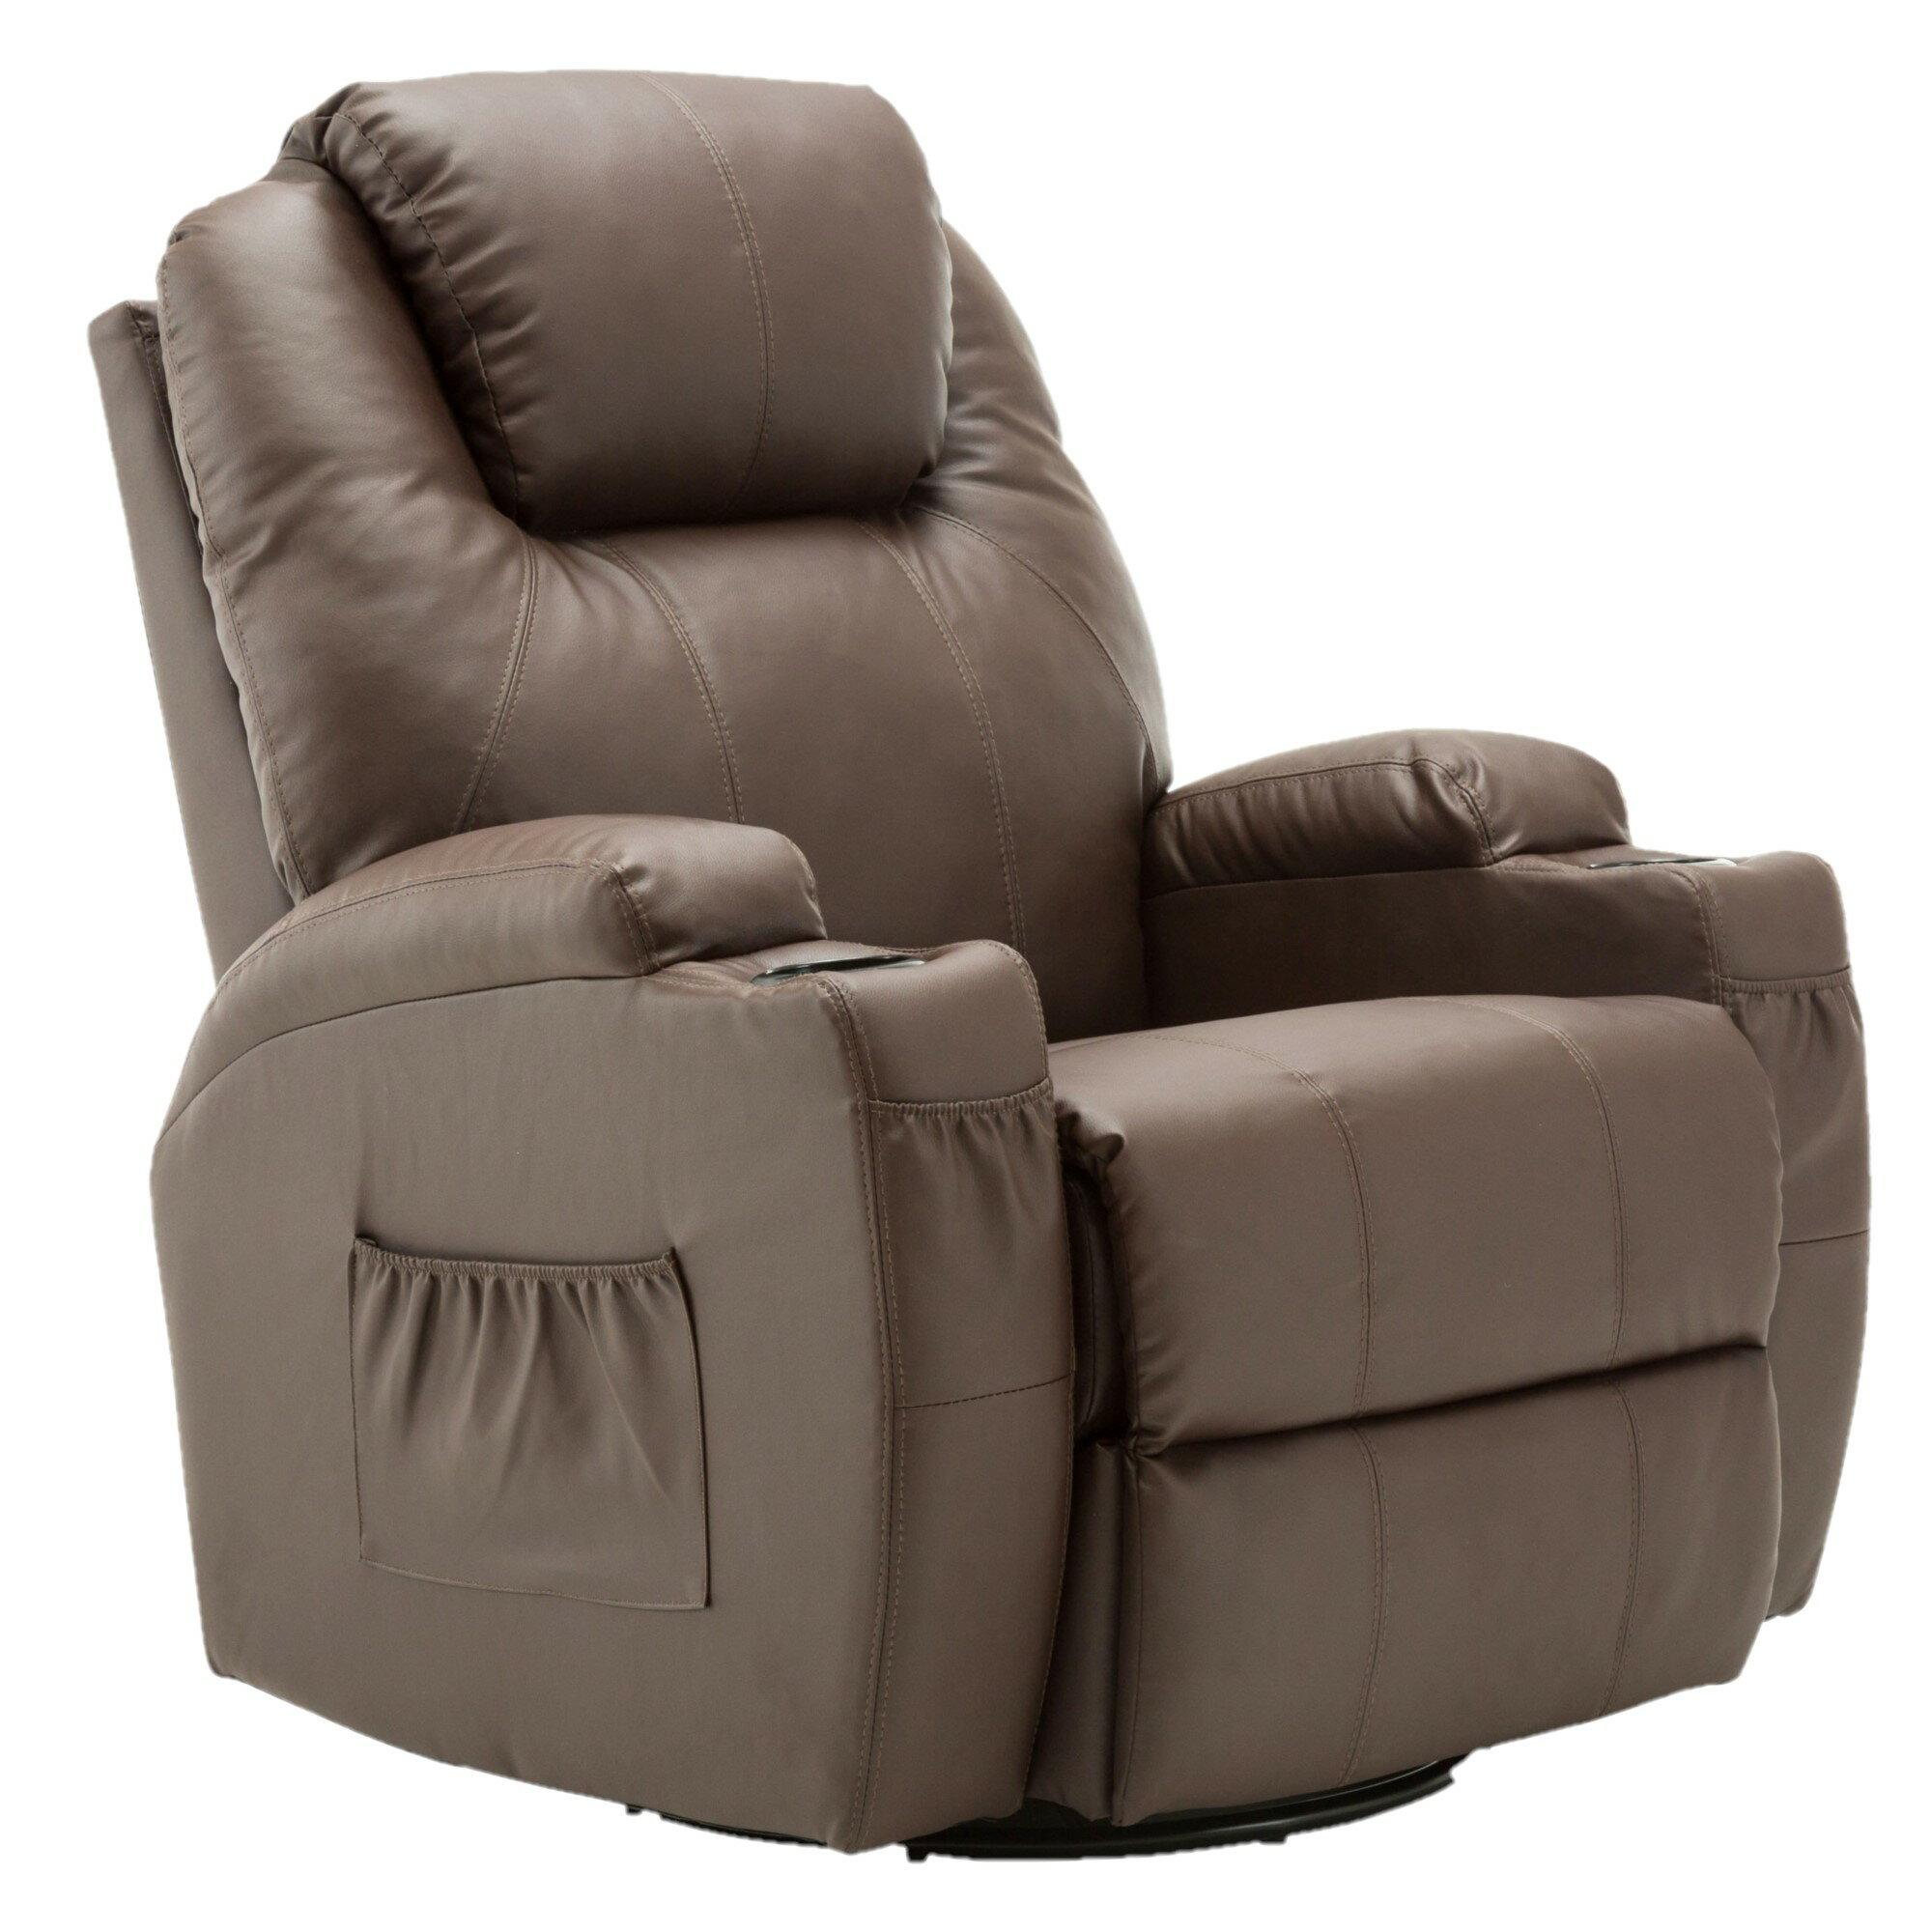 cee0499035 Modern Massage Recliner Chair Vibrating Sofa Heated PU Leather Ergonomic  Lounge 360 Degree Swivel Rocker 8031